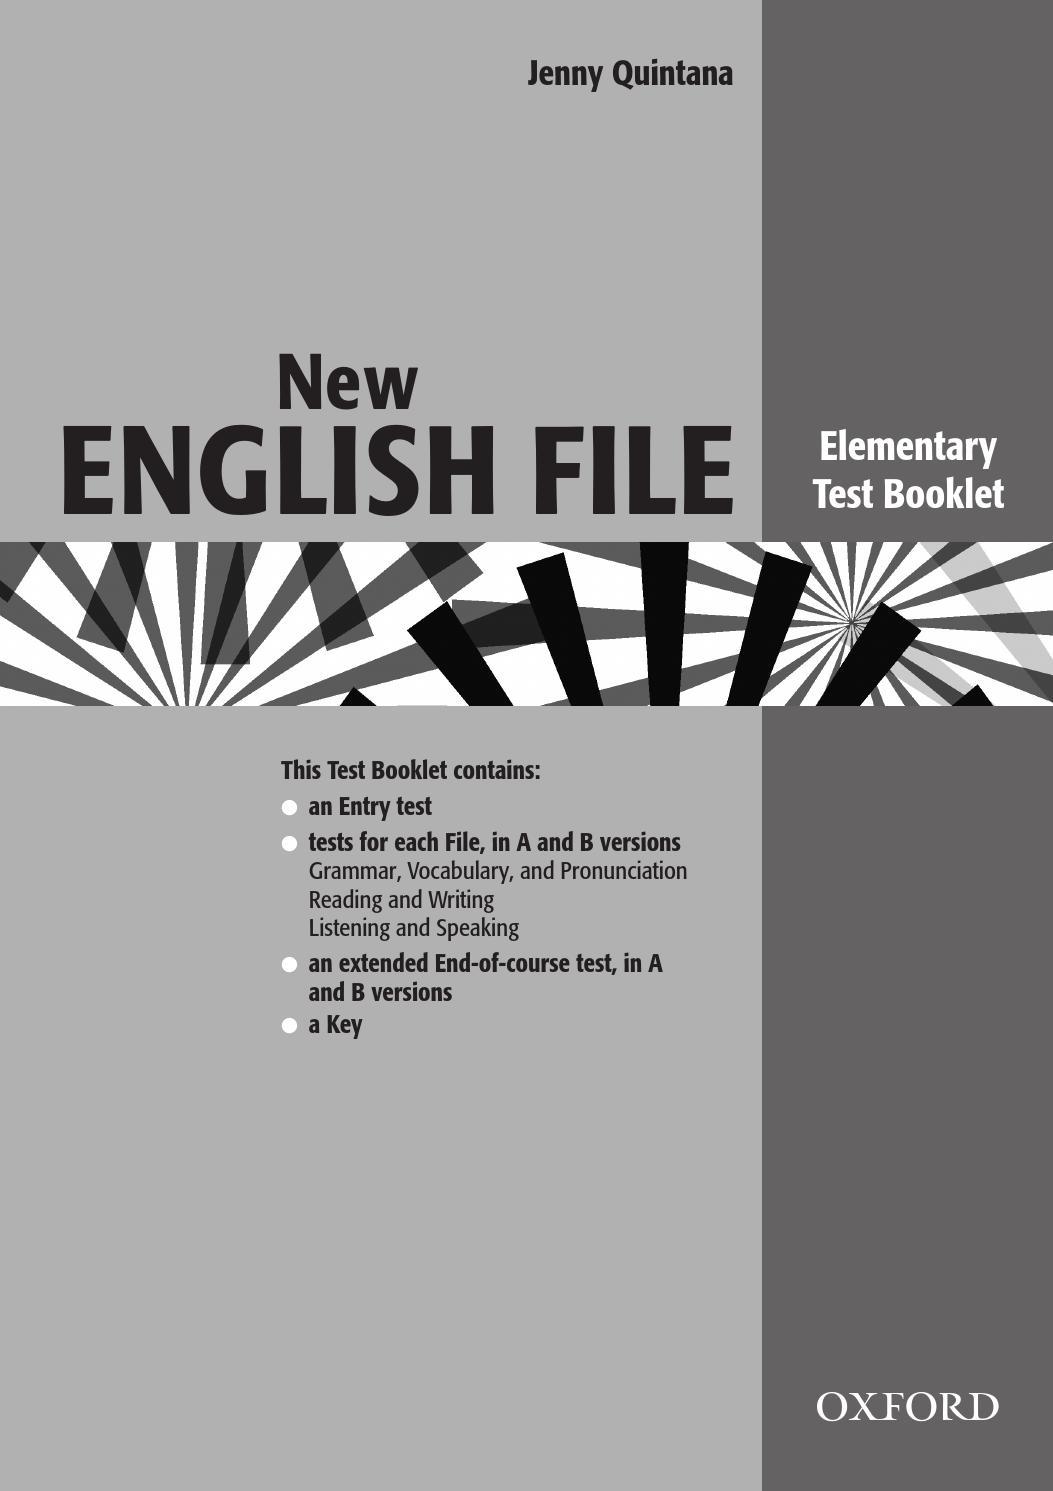 Solutions Elementary Test Book Бесплатно